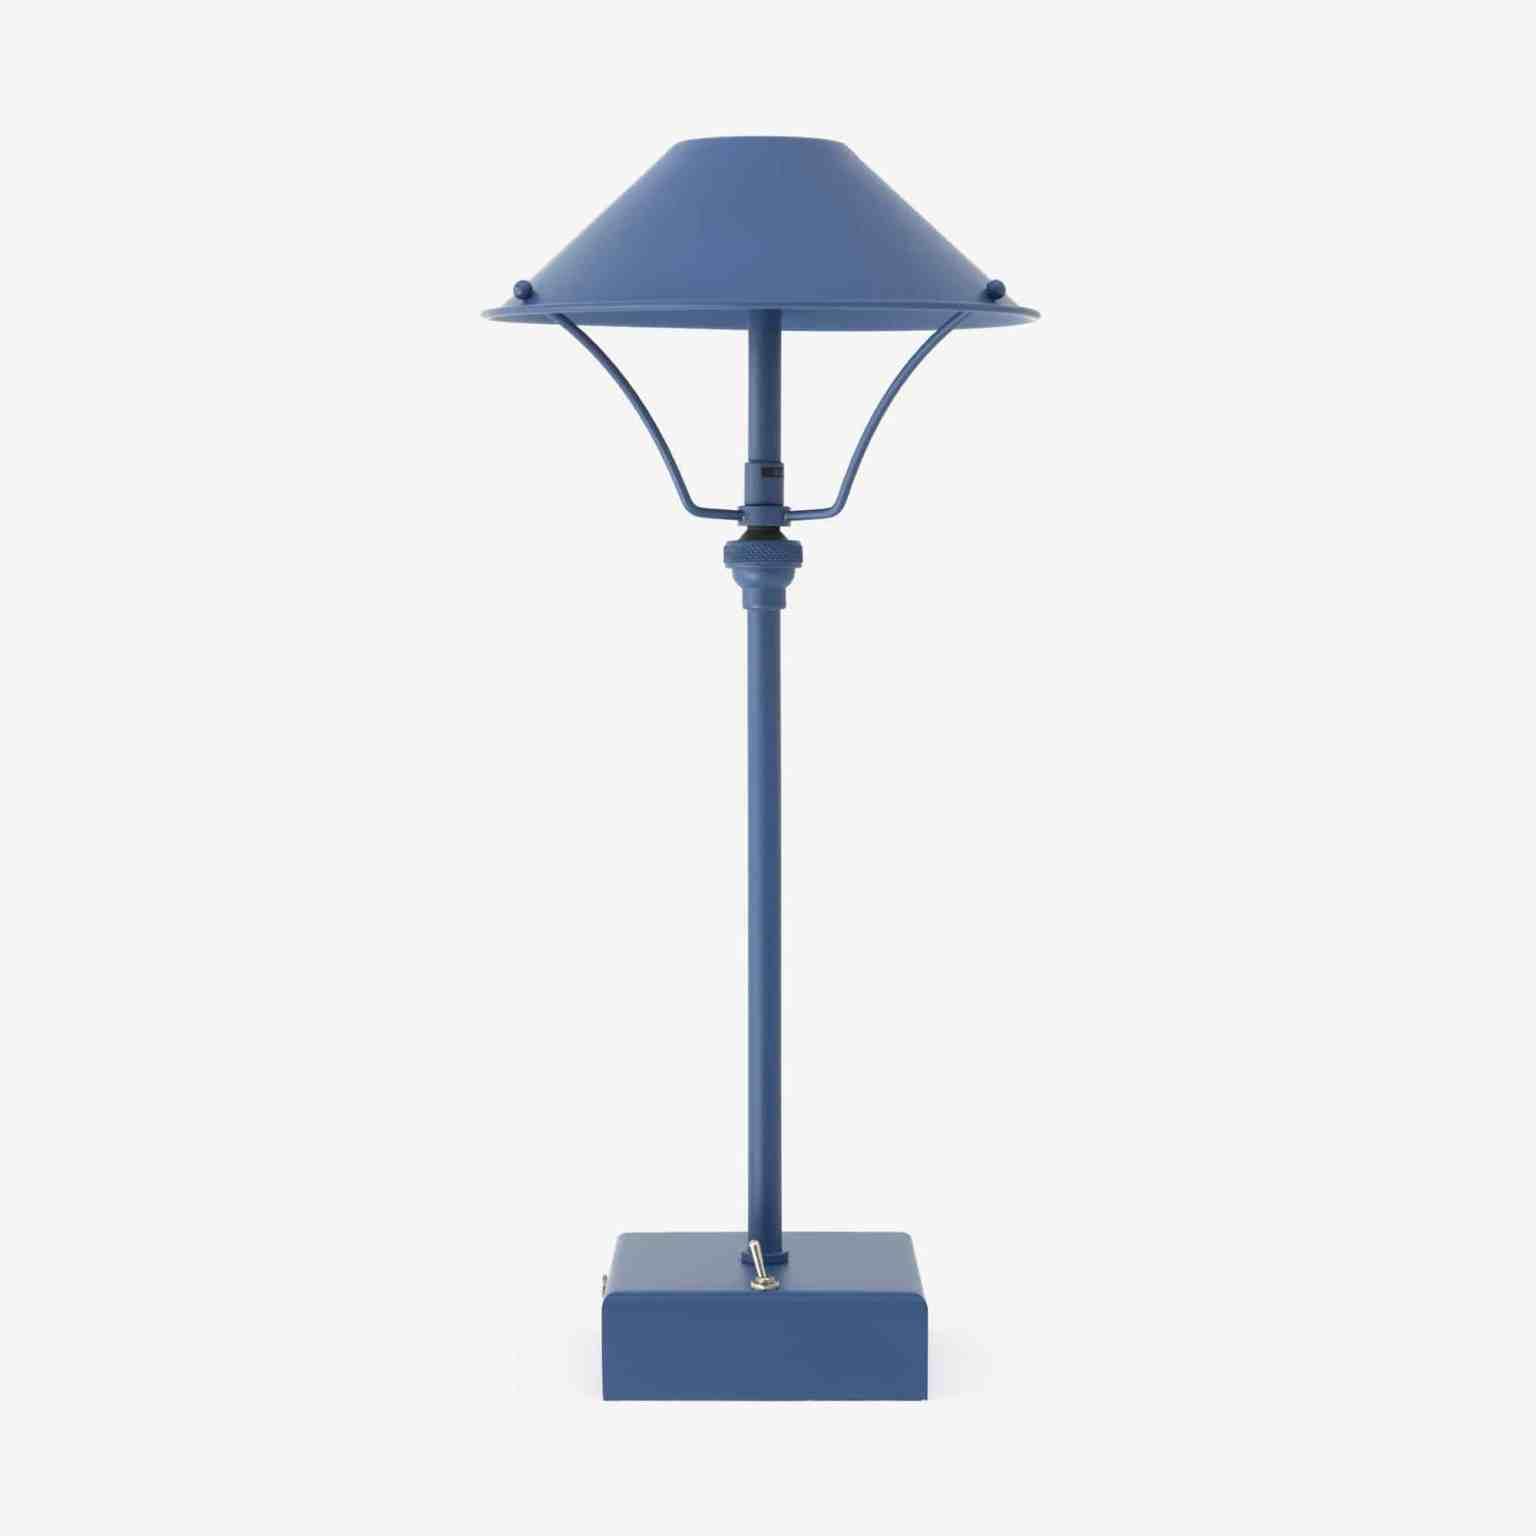 homeware bellissimo alari lampada ambrina mezzatorre issimo